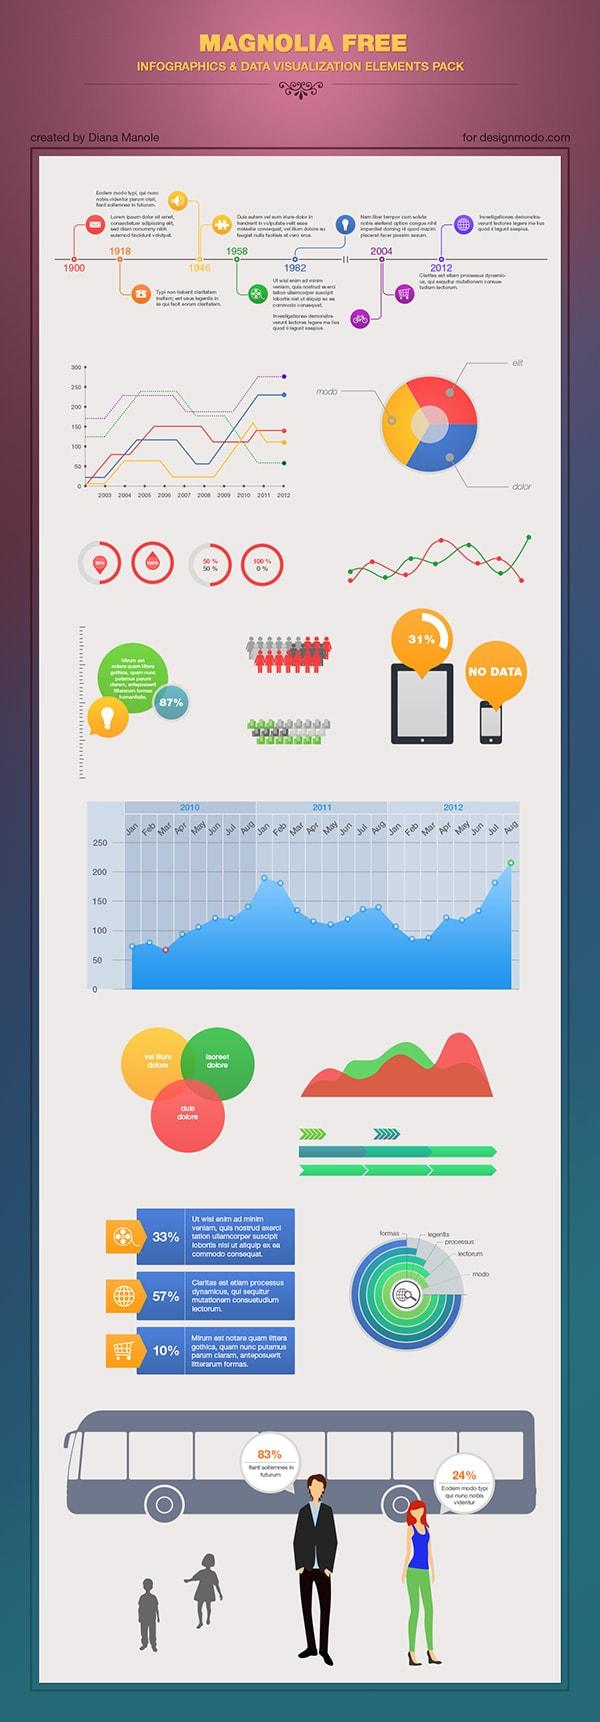 Magnolia Free - Infographic PSD Template - Designmodo